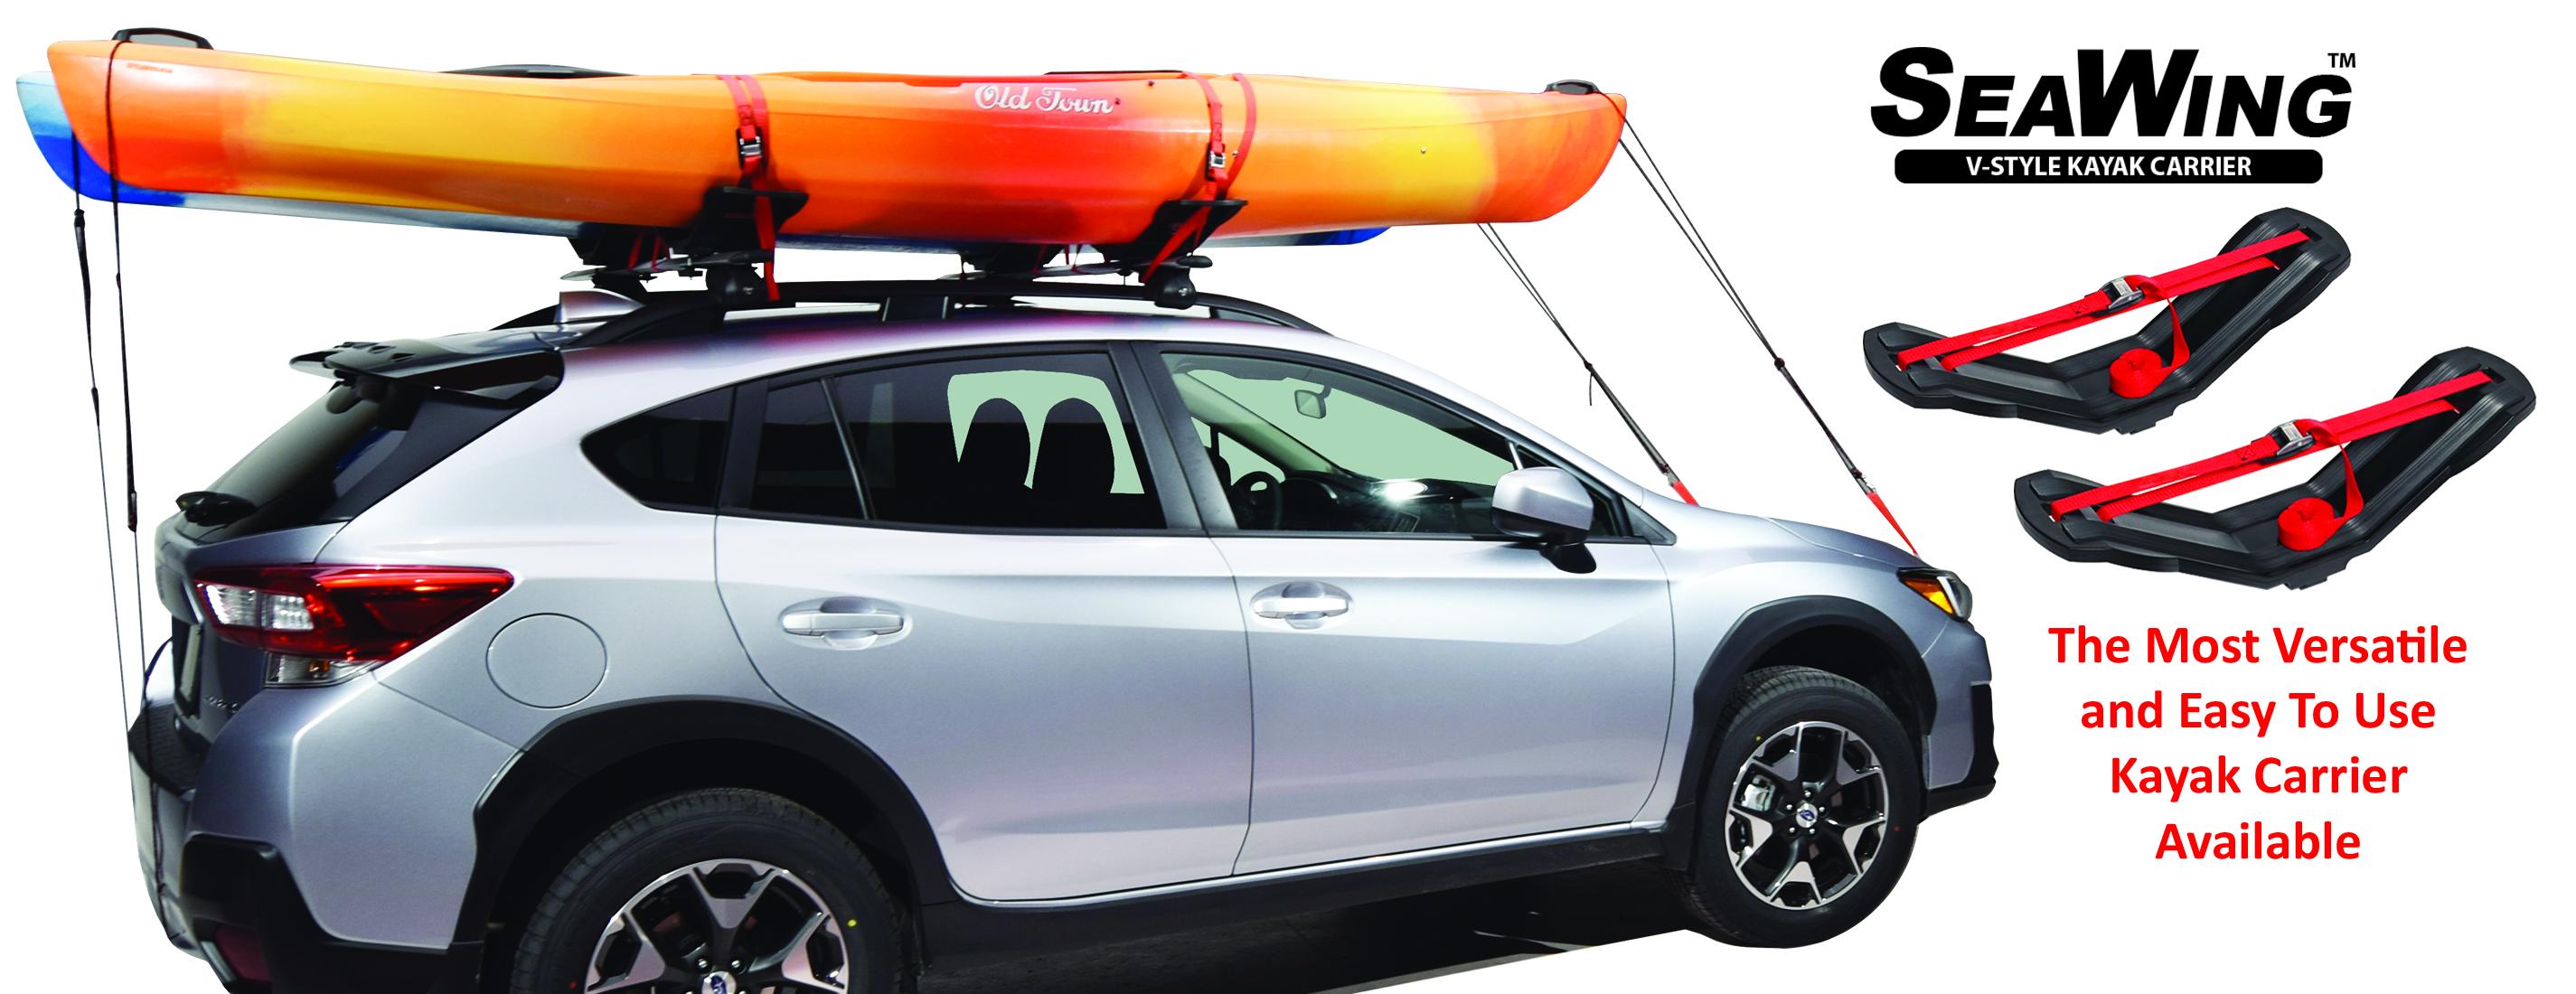 Car Racks and Truck Racks | Bike Racks | Kayak Carriers